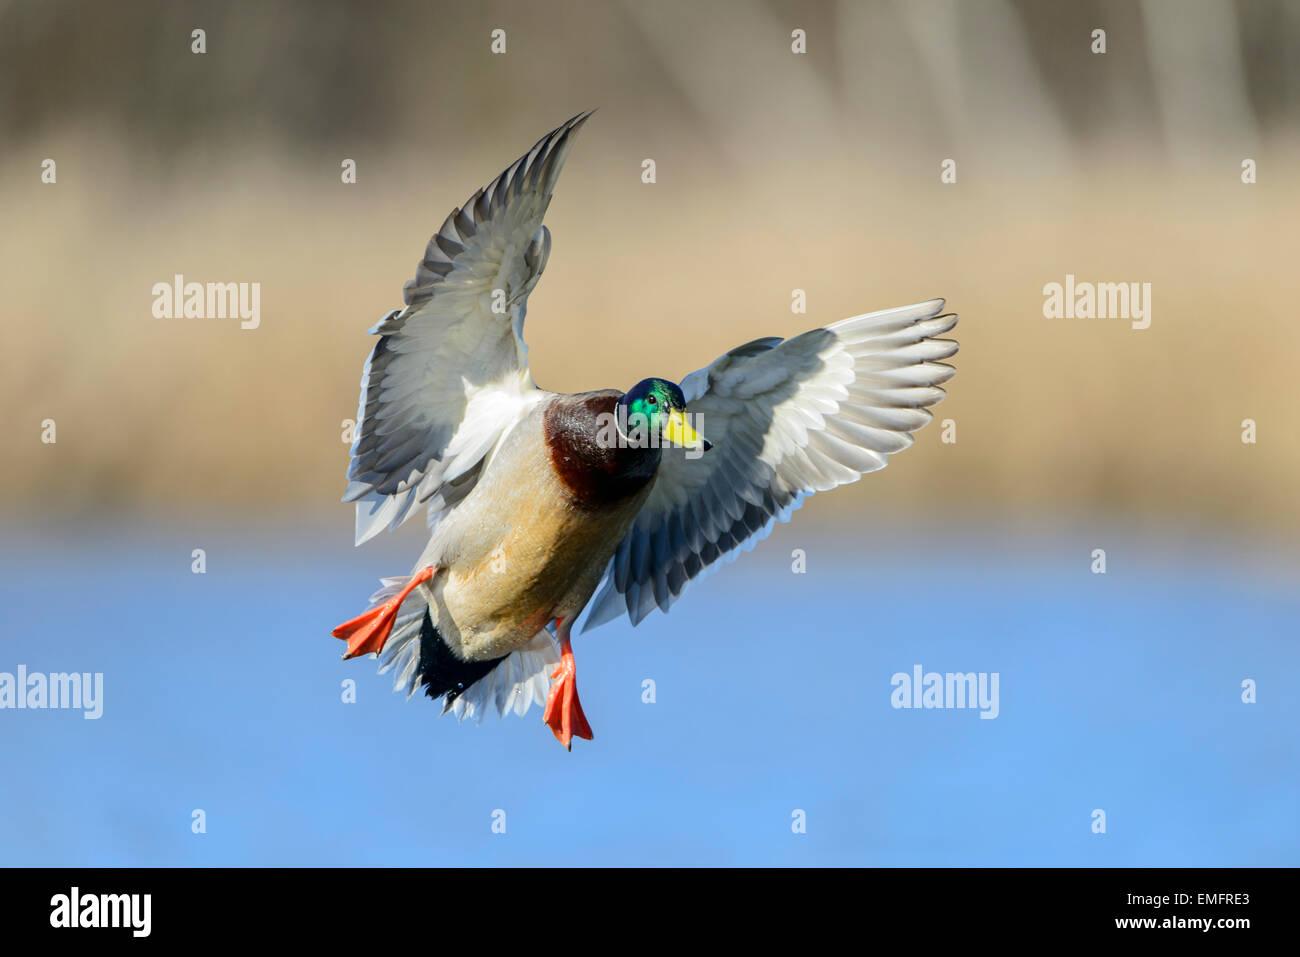 Mallard (Anas platyrhynchos) in flight, Pacific Northwest - Stock Image